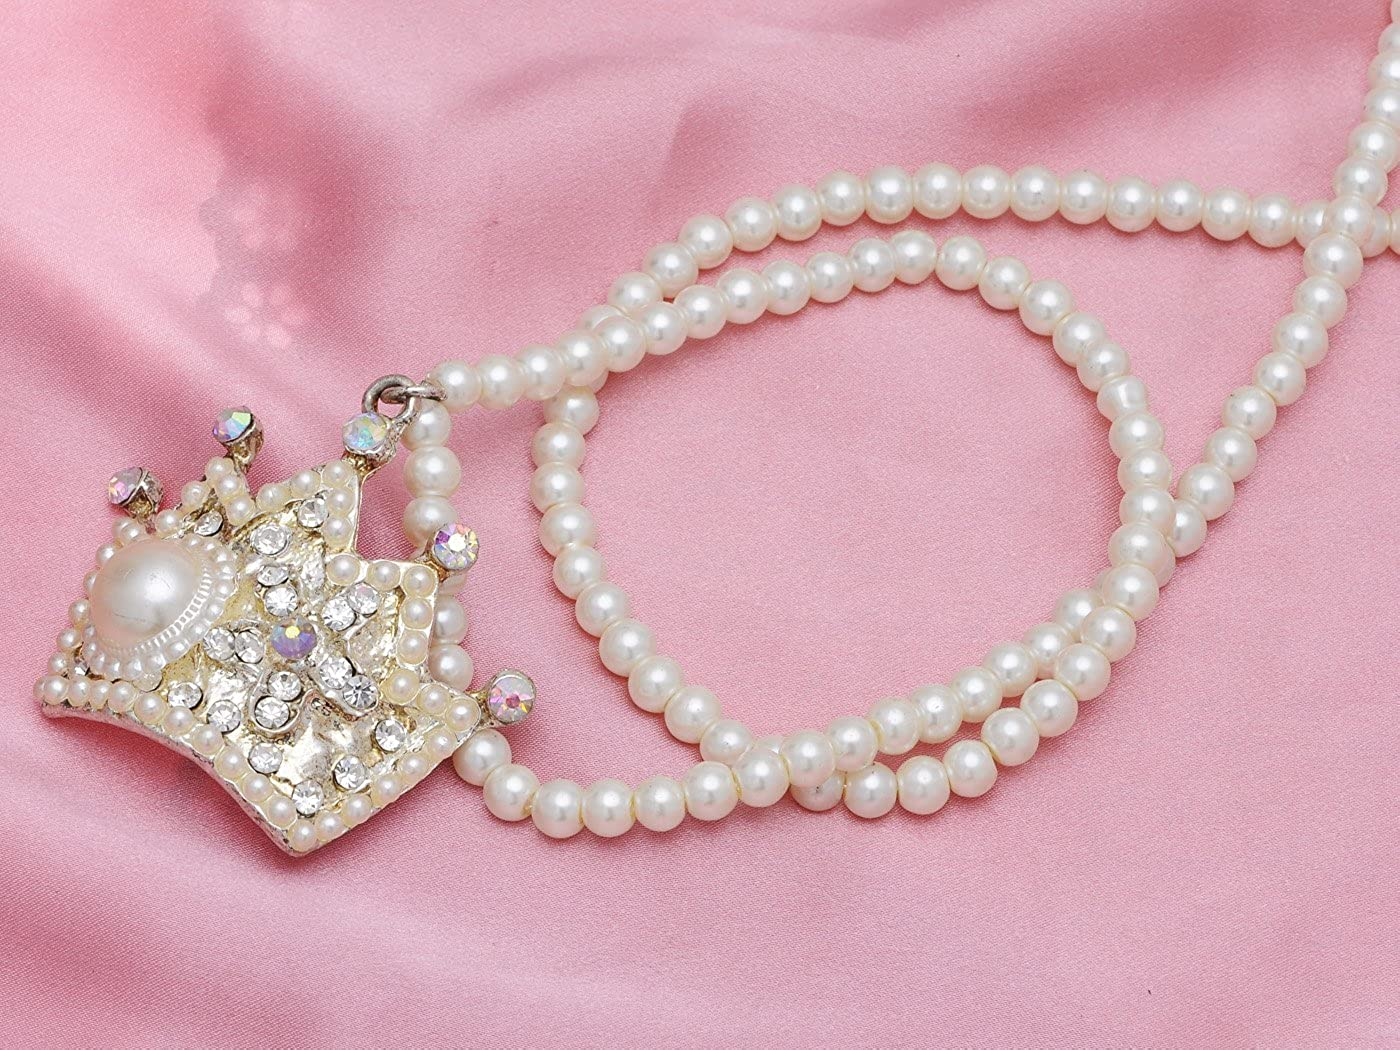 Alilang Faux Pearl Bead Strand Byzantine Royal King Crown Rhinestone Pendant Necklace